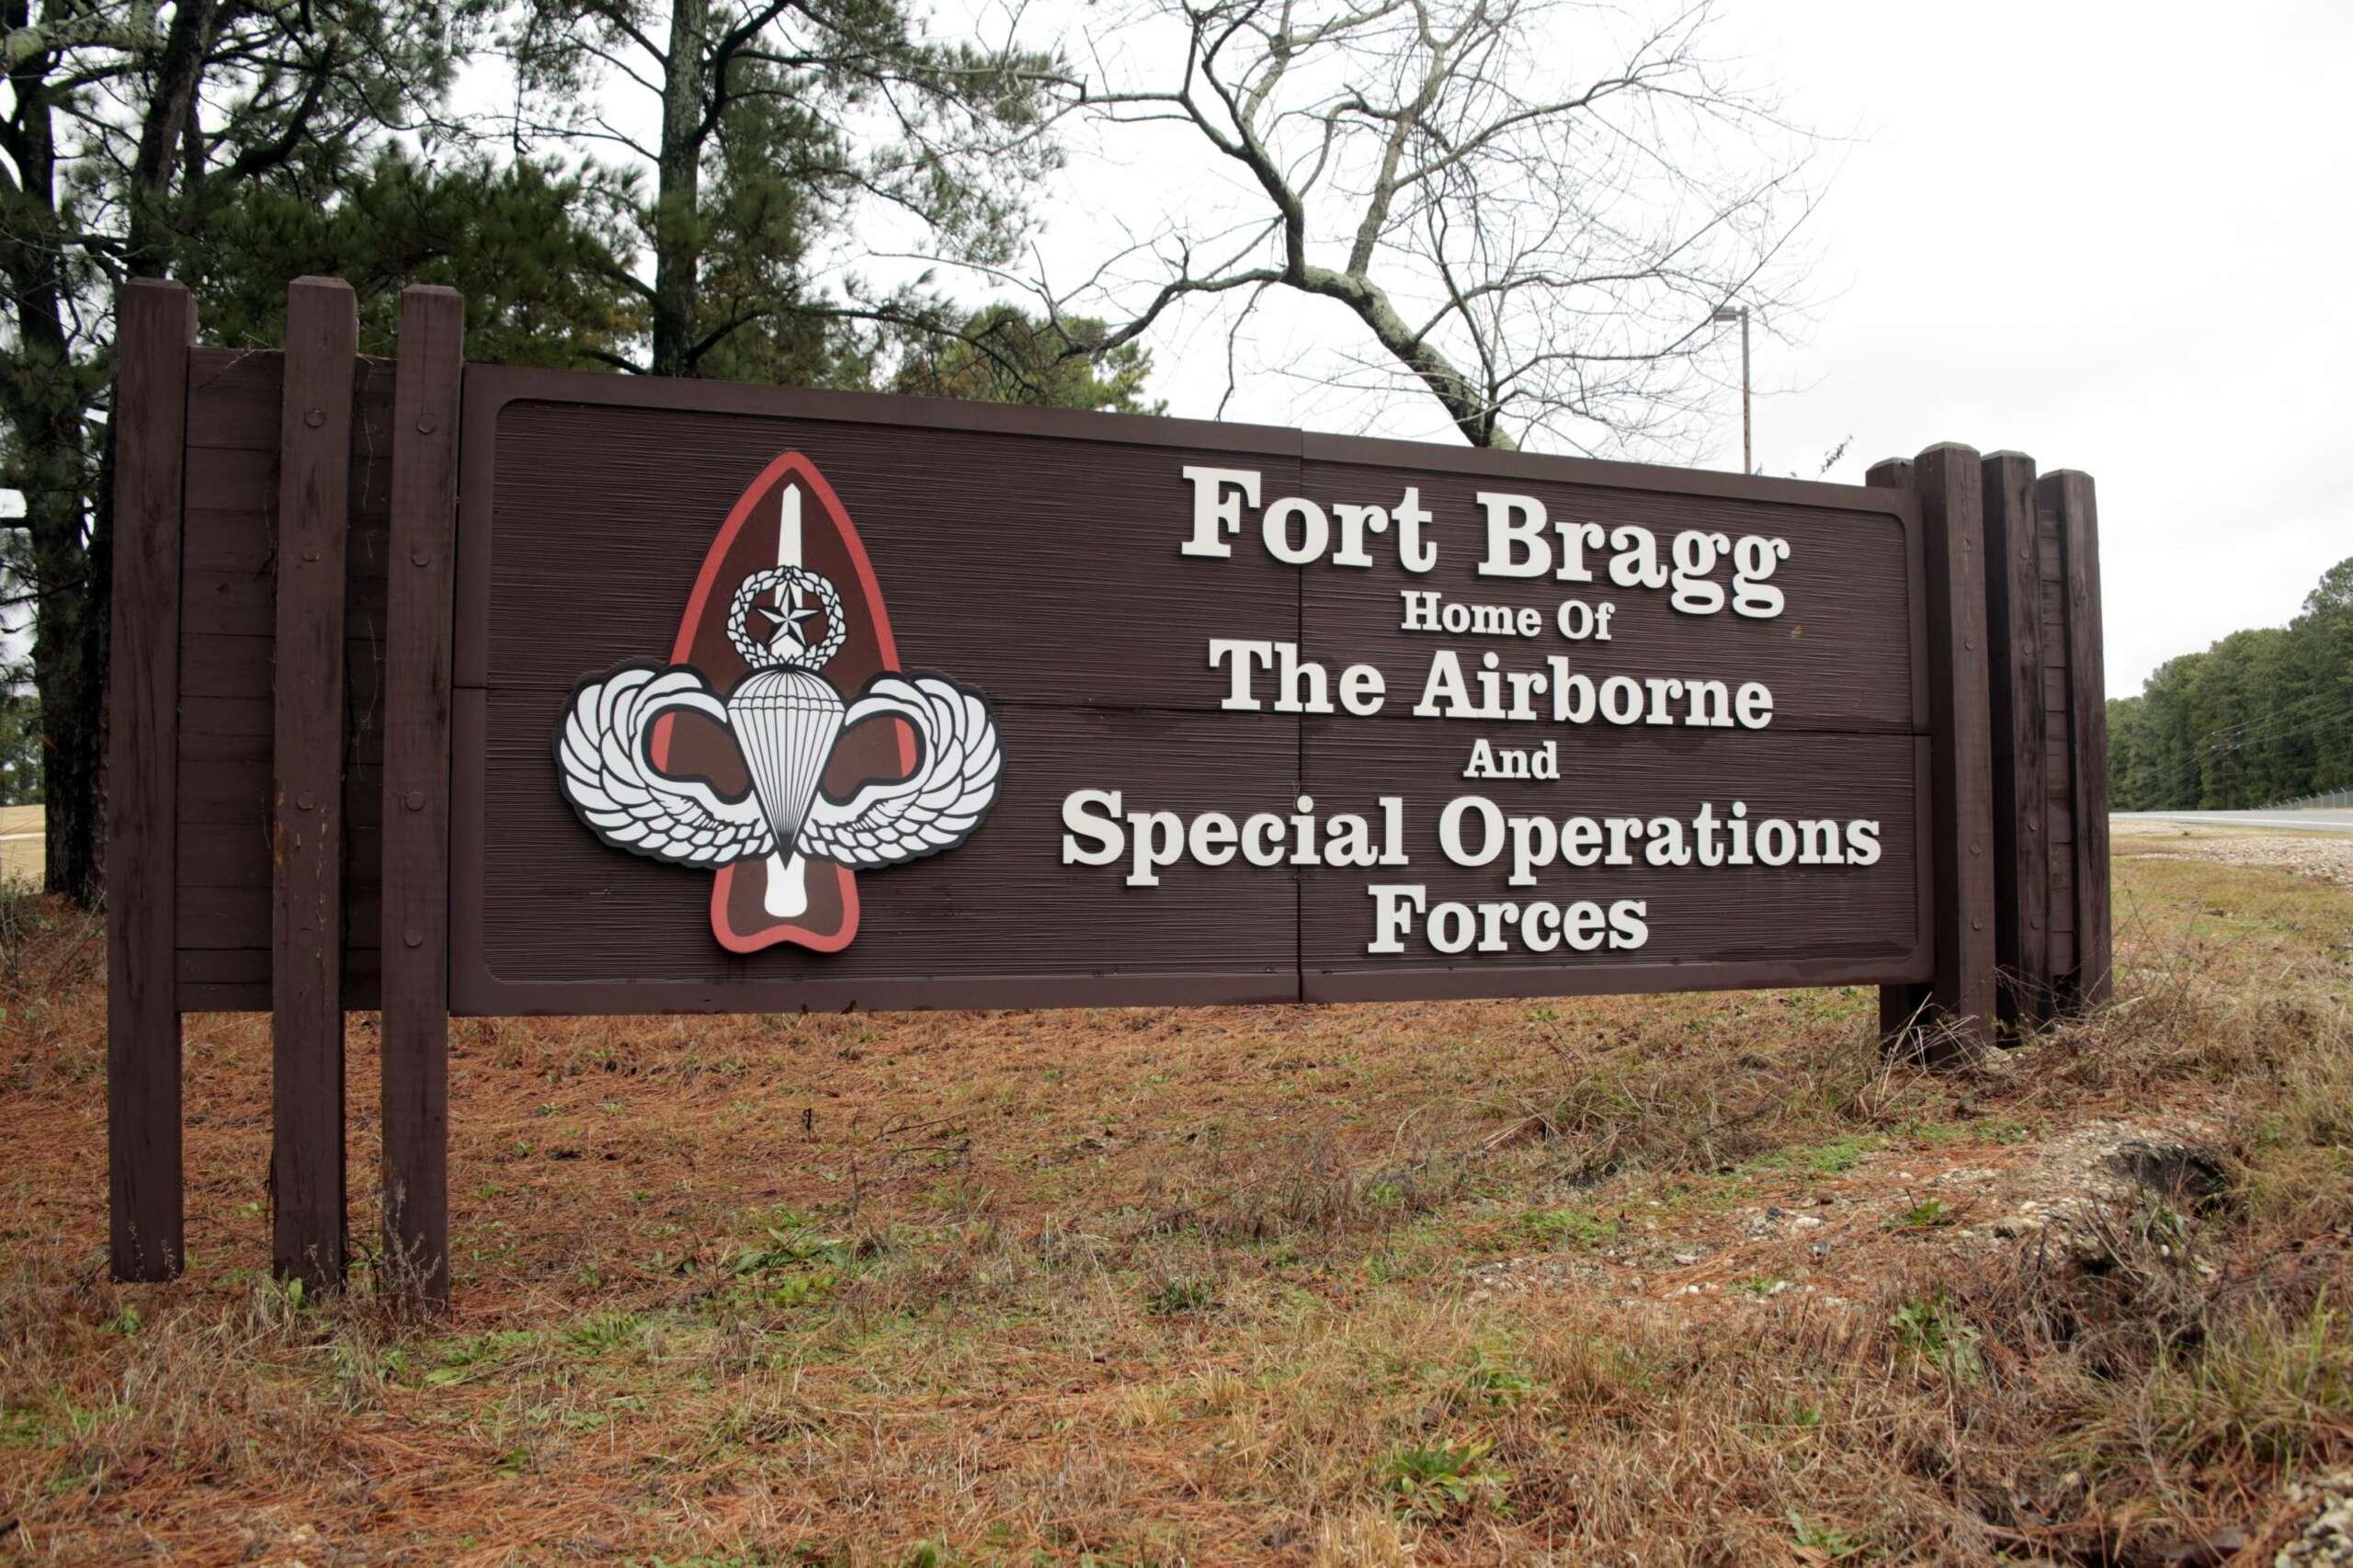 Military Base Names Confederacy 50898 scaled.